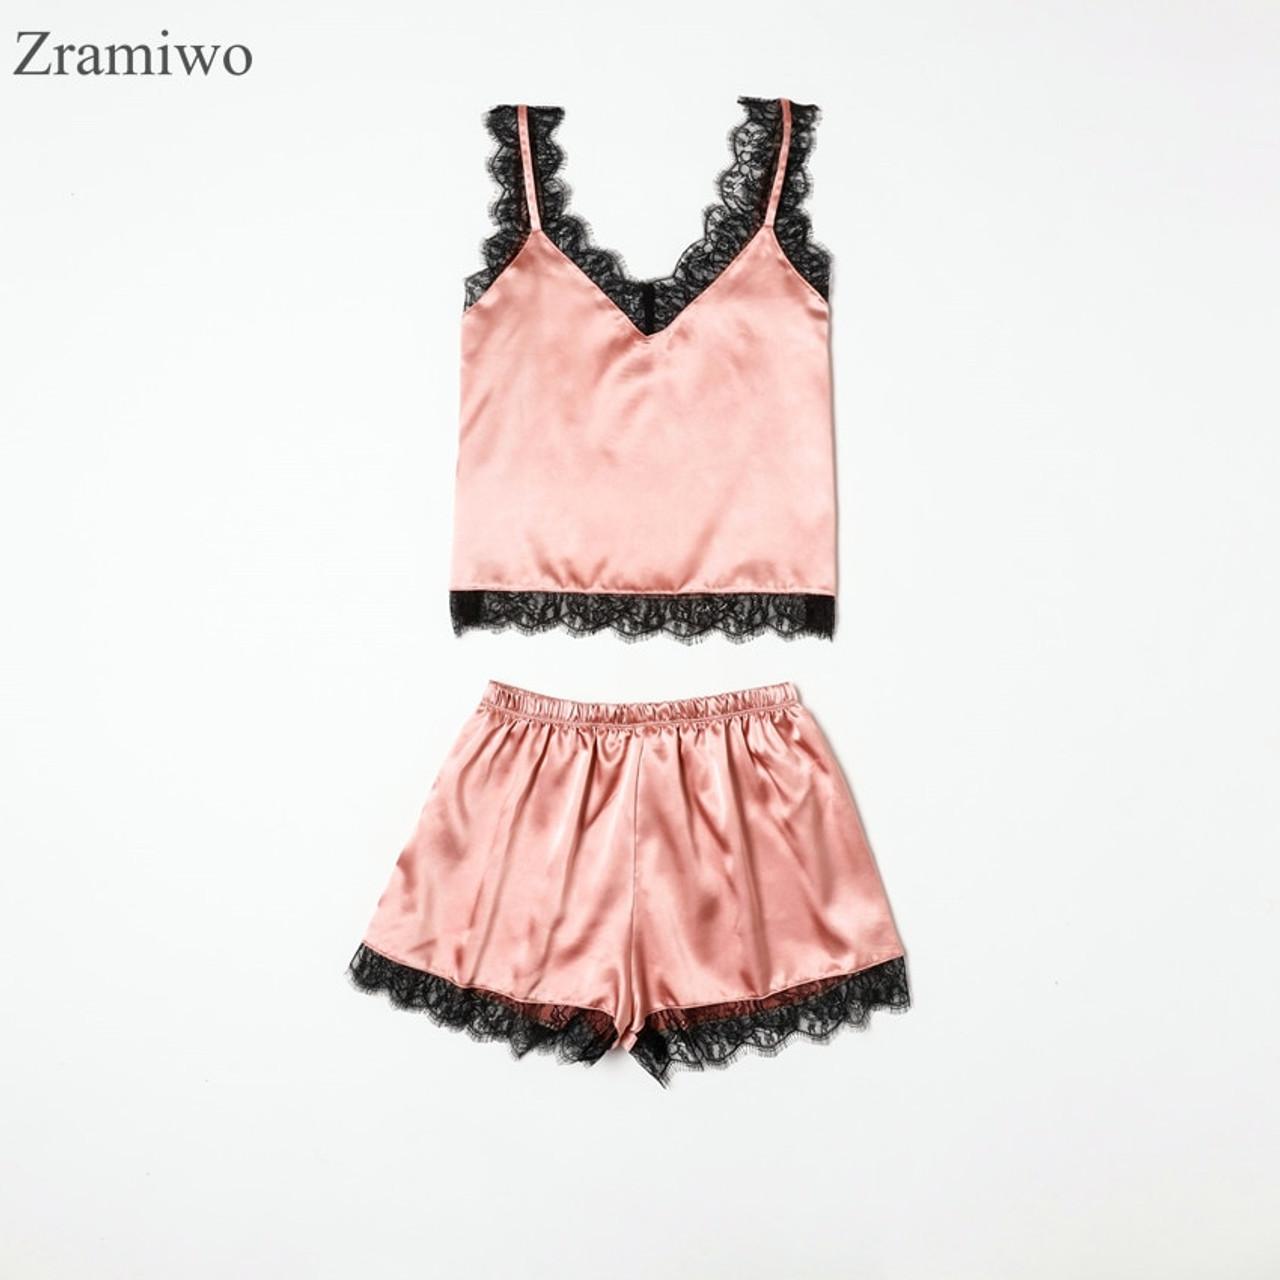 87a1b4b9de Summer Sleepwear Sexy Satin Pajamas Set Lace Cami Tops and Shorts  Sleeveless Nightwear for Women ...